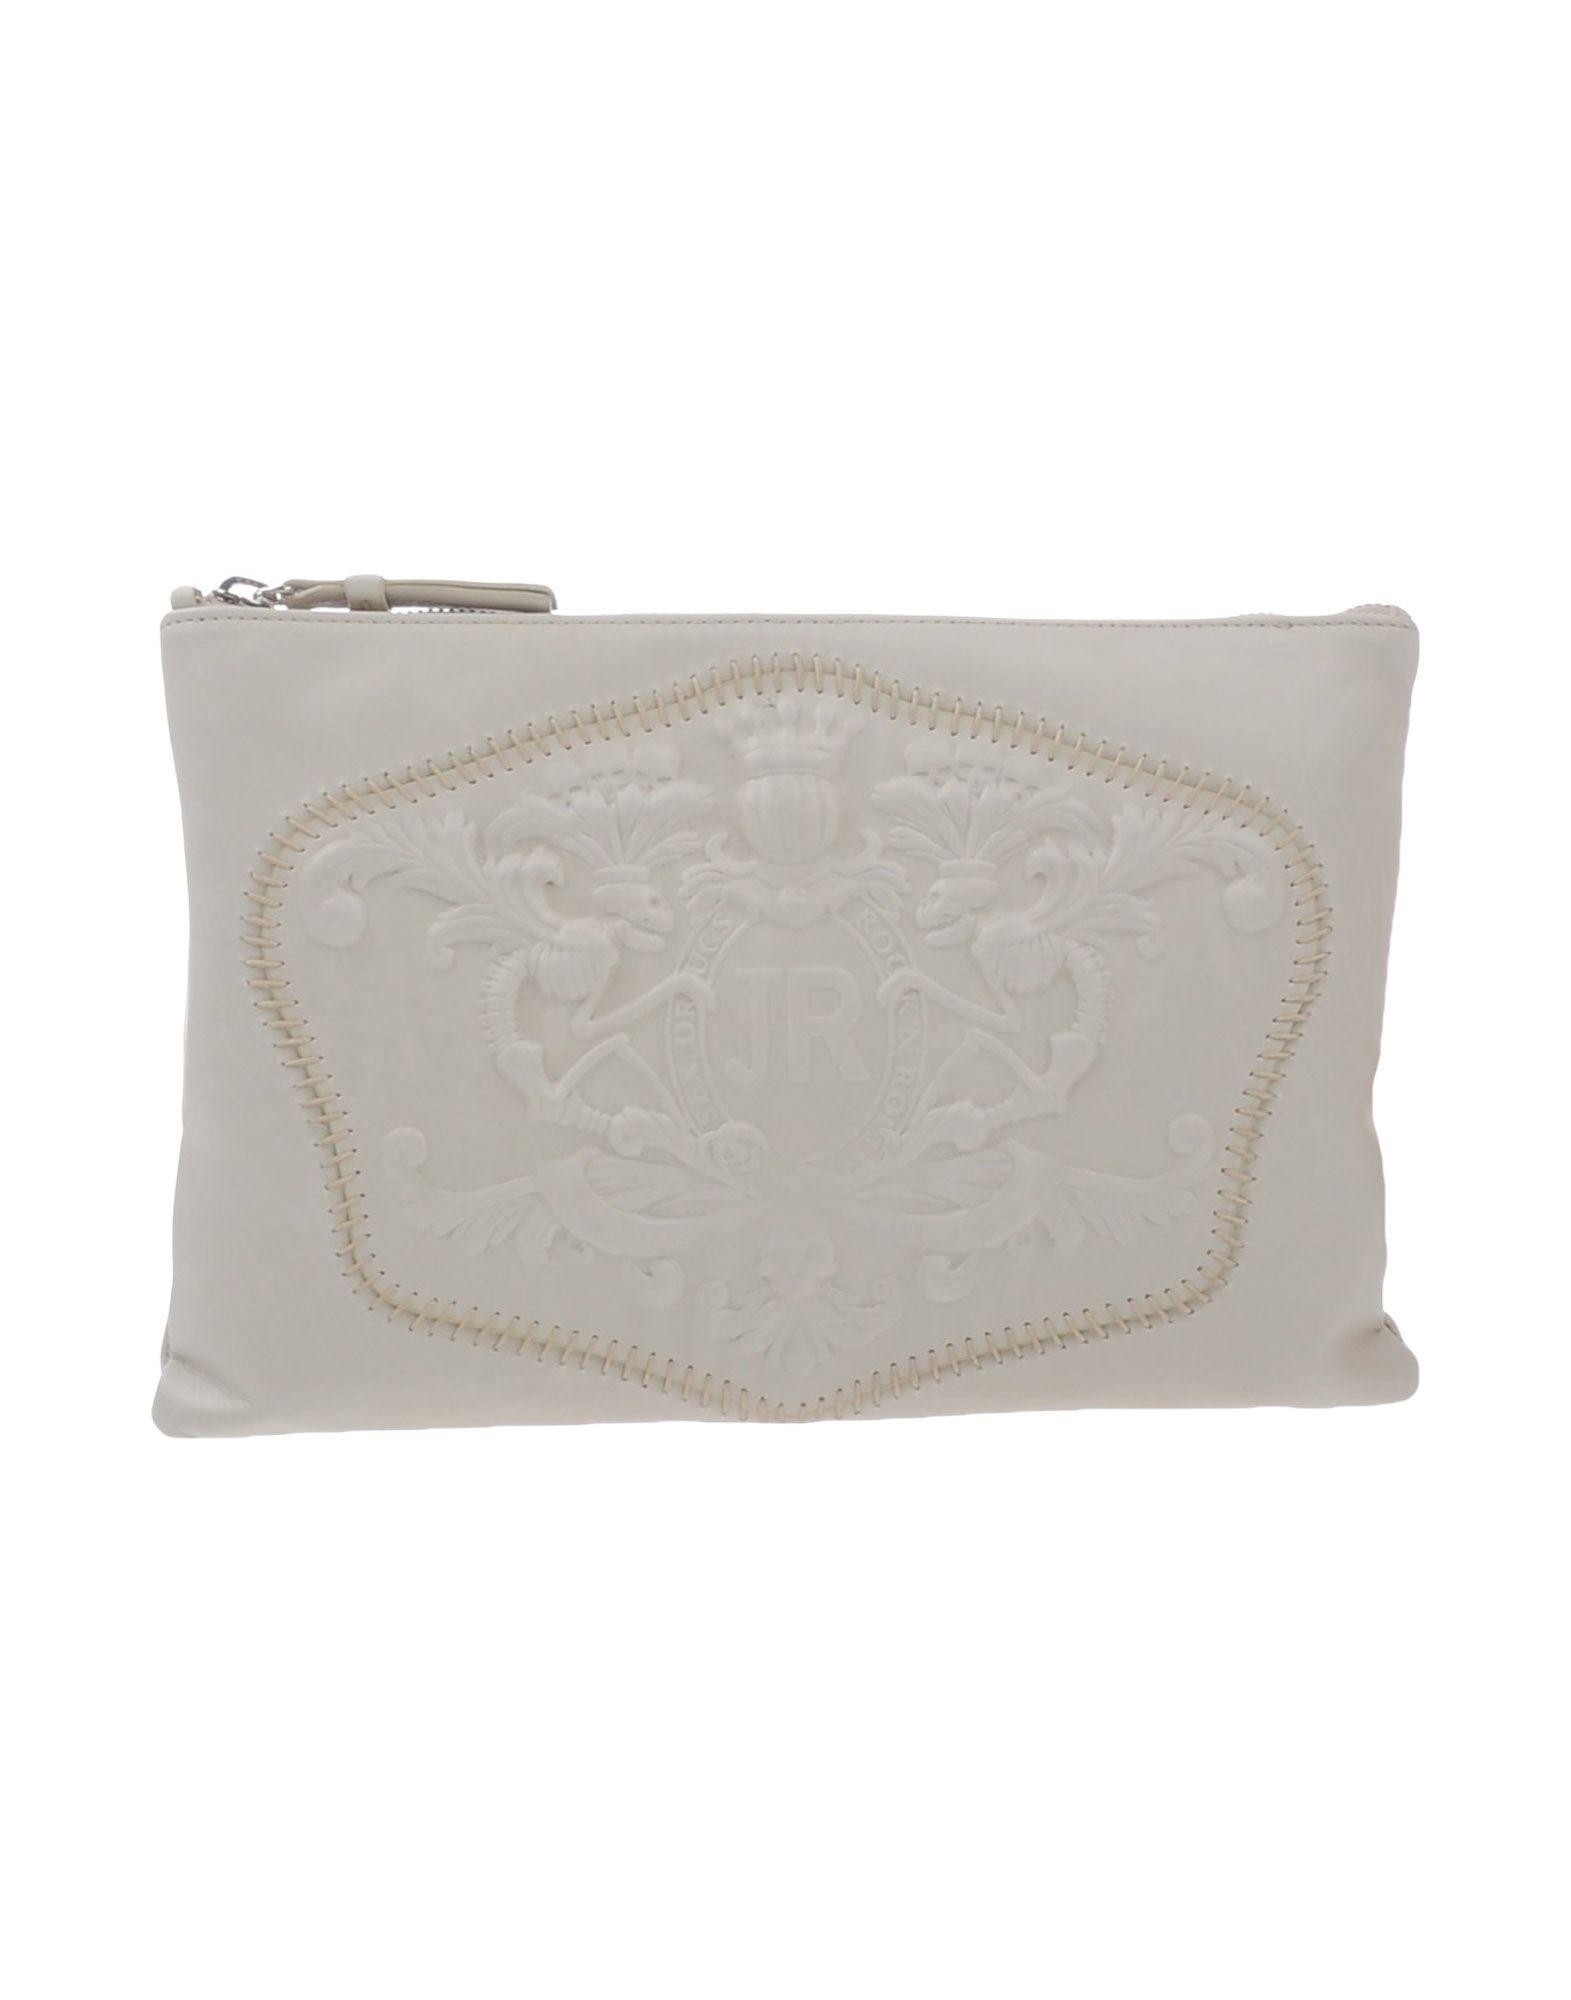 John Richmond Handbags Ivory